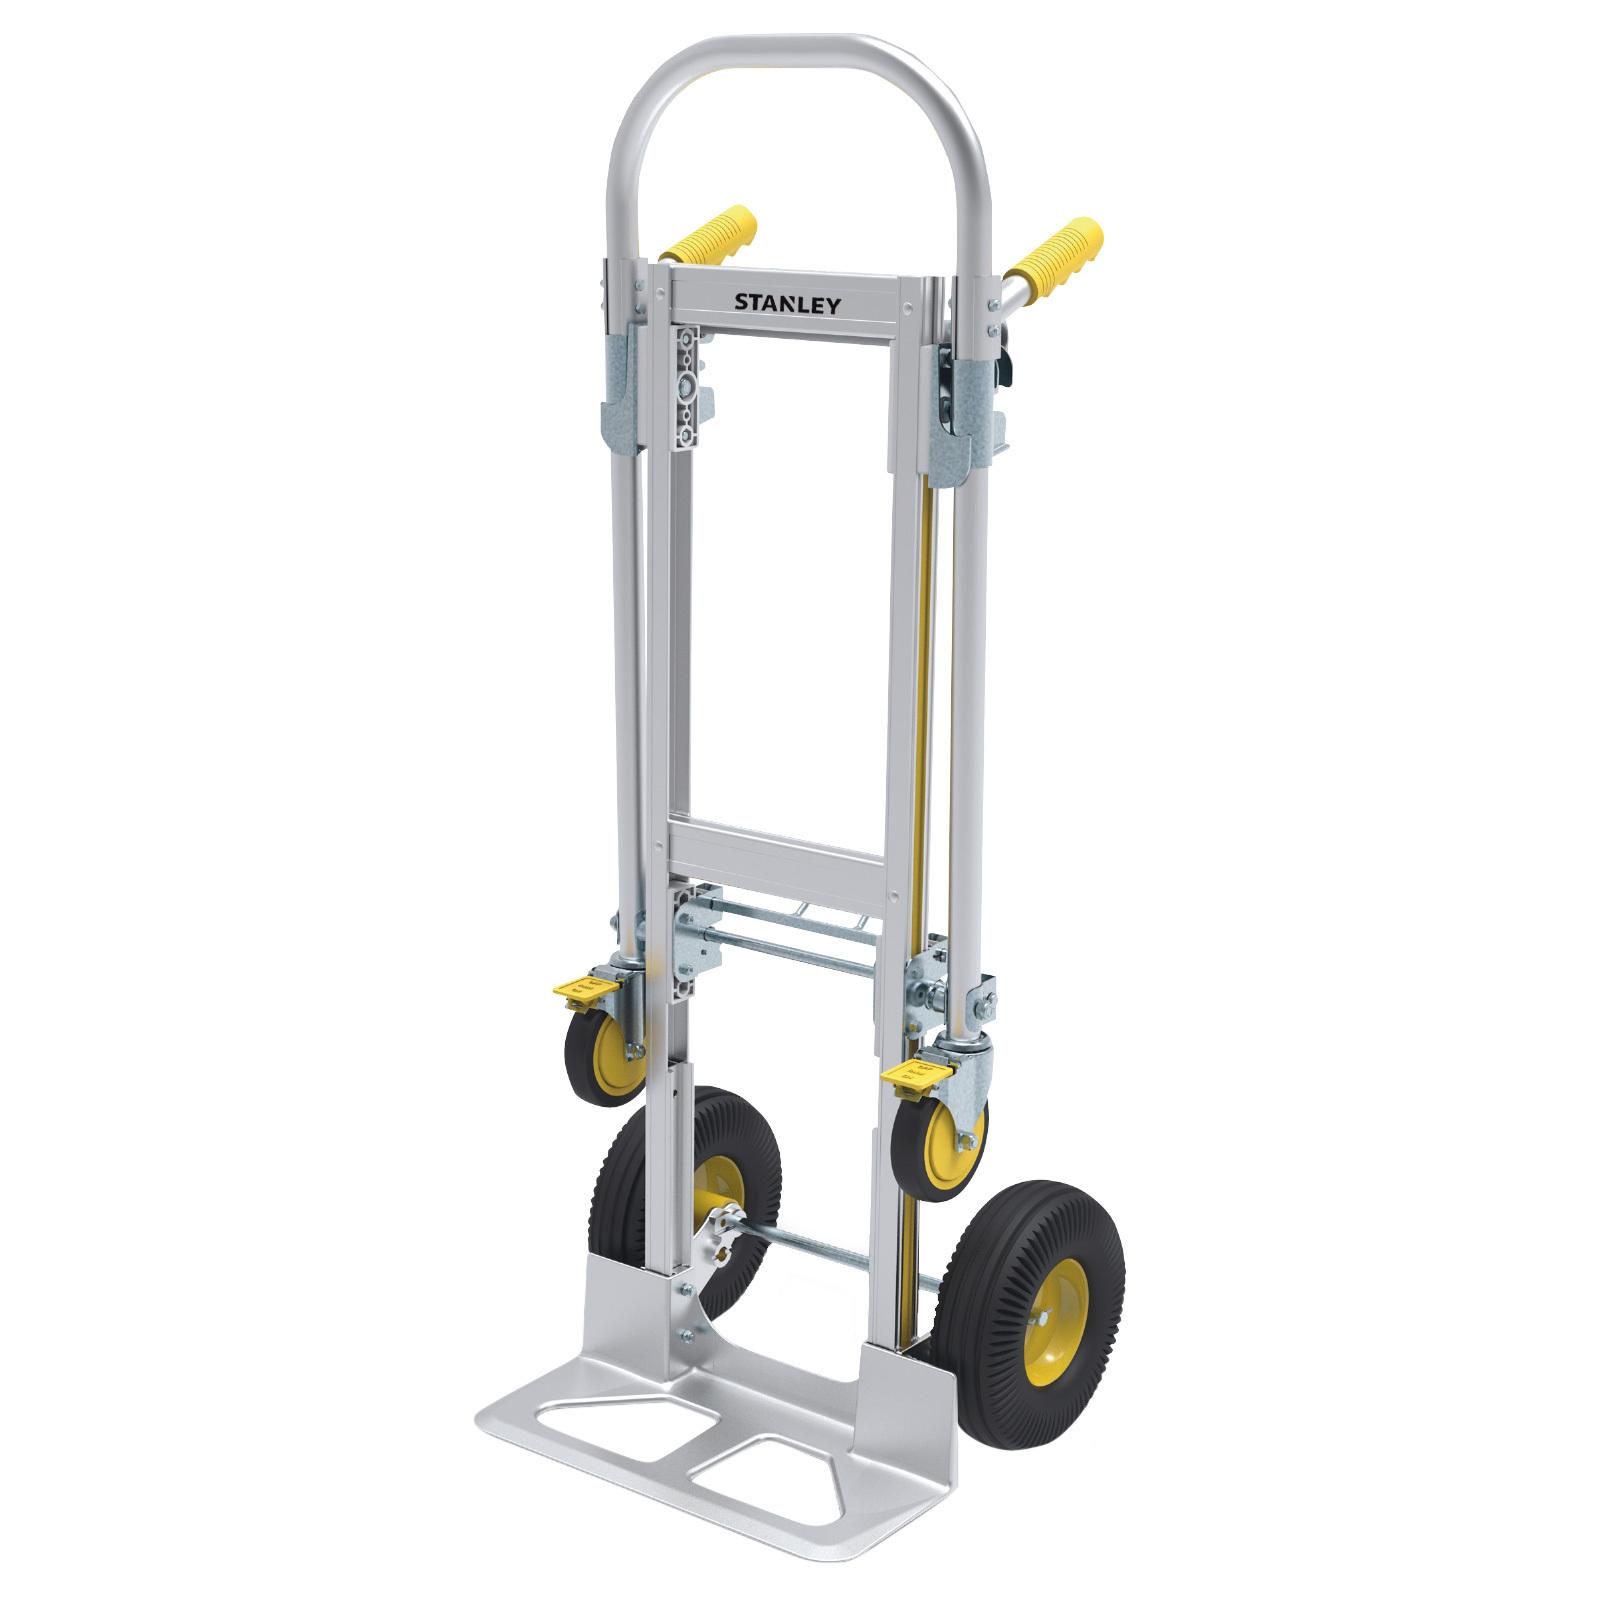 Stanley 200 / 250kg Multi Fold Hand Trolley